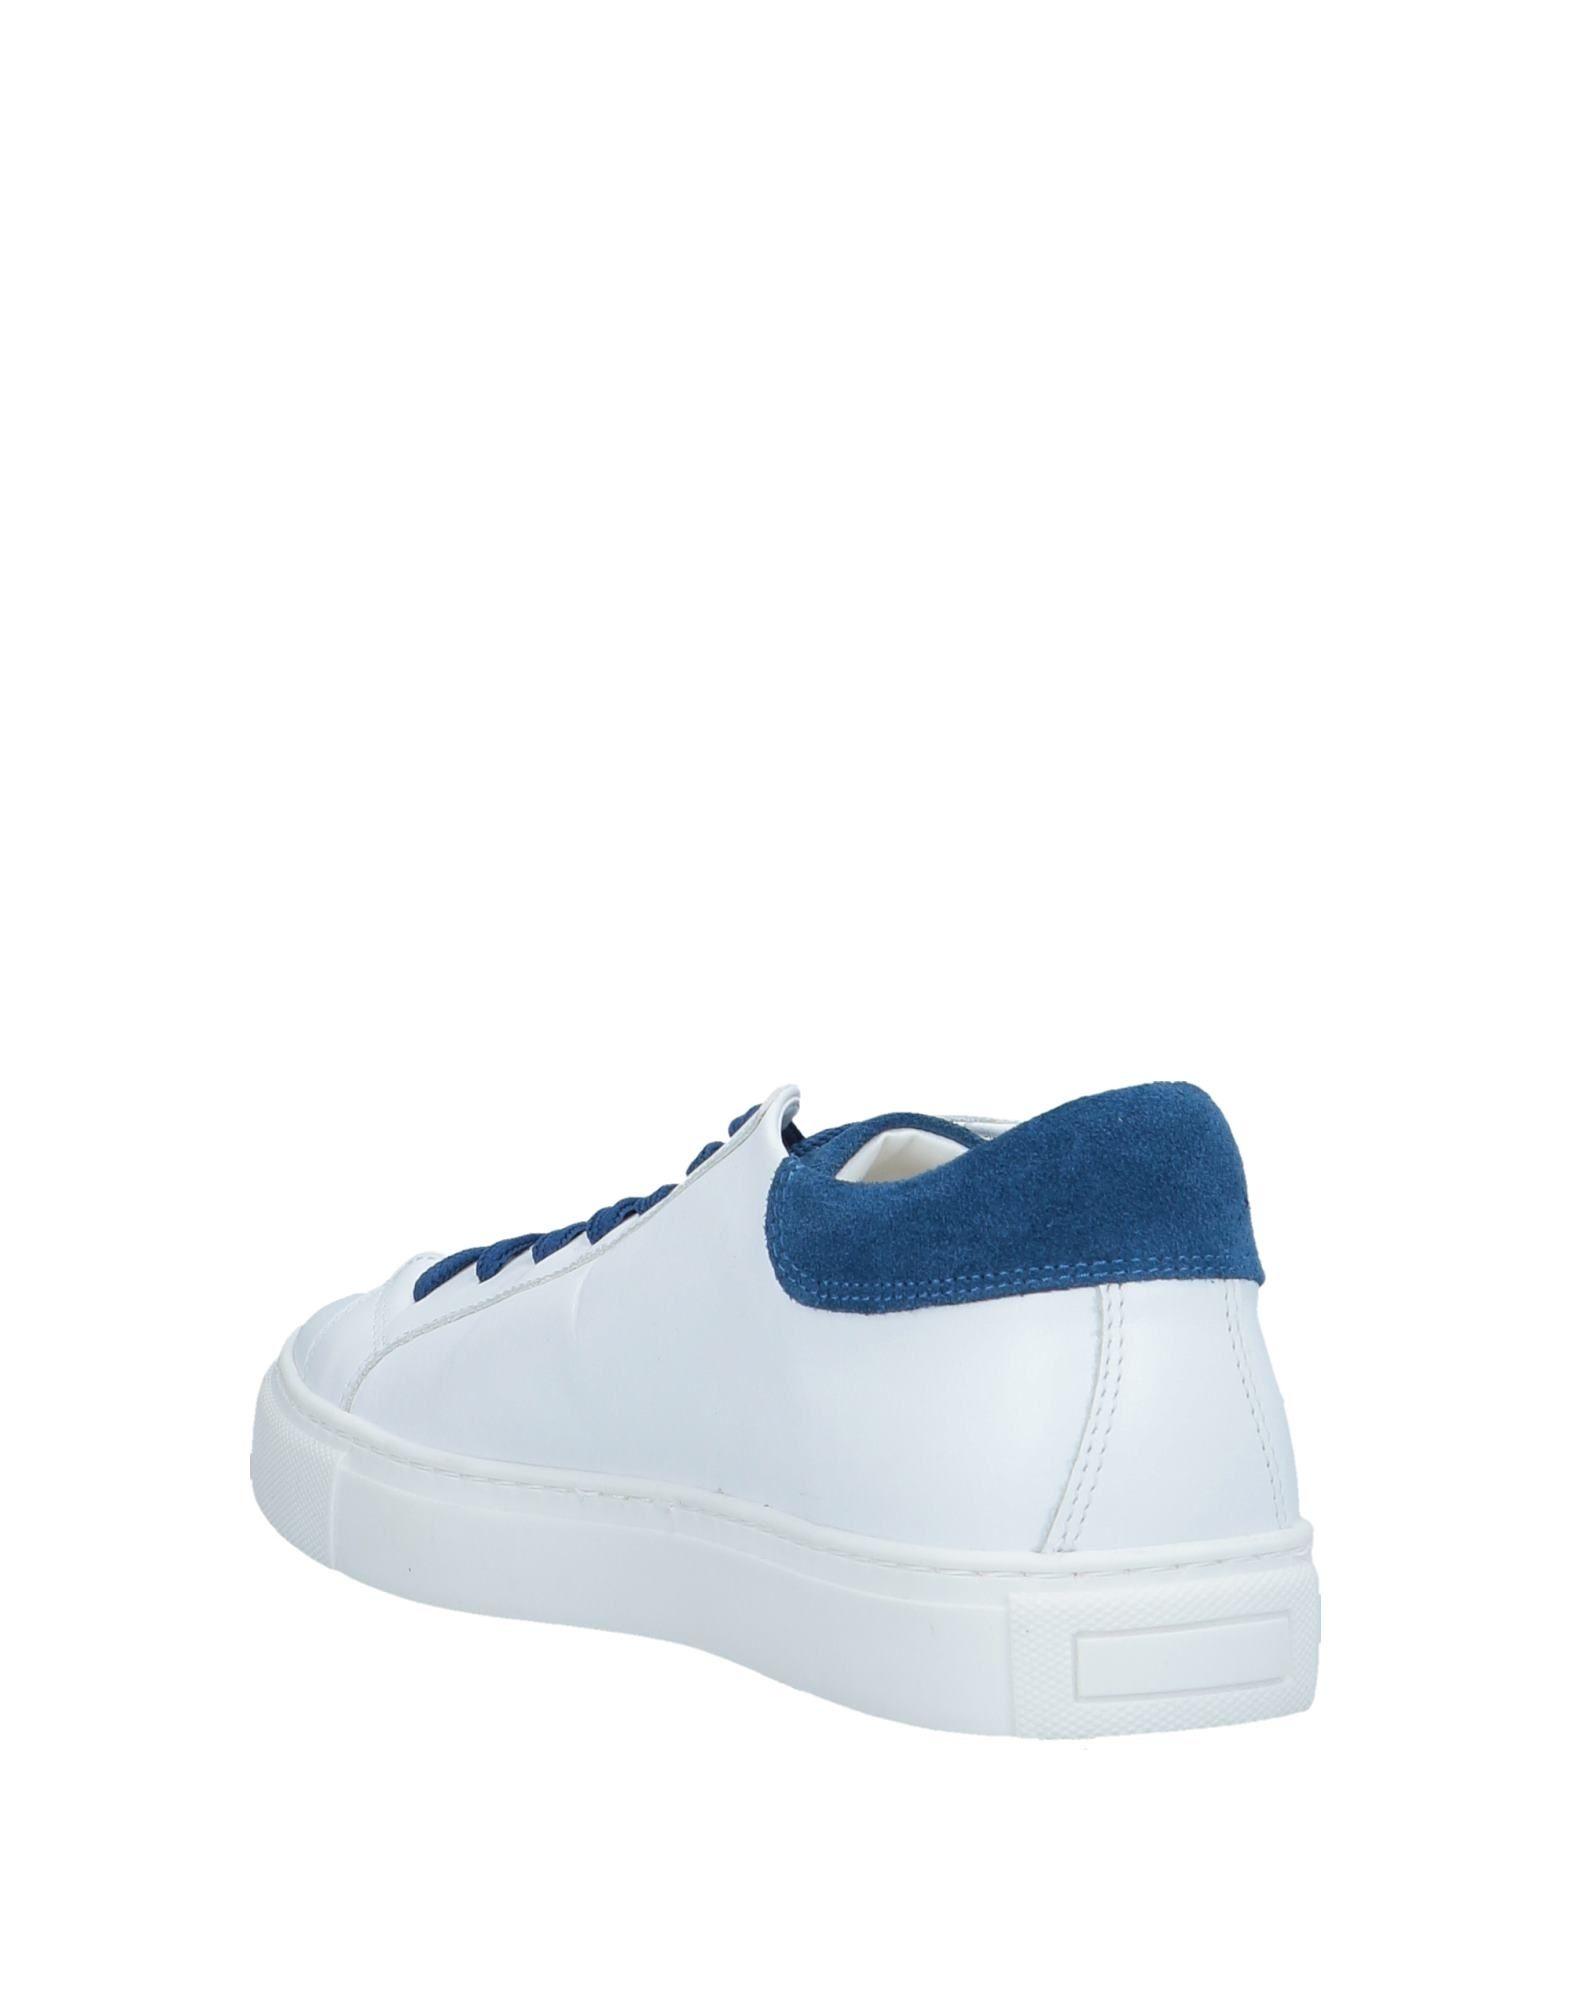 A.Testoni Sneakers online - Men A.Testoni Sneakers online Sneakers on  Canada - 11542560MQ 5a5894